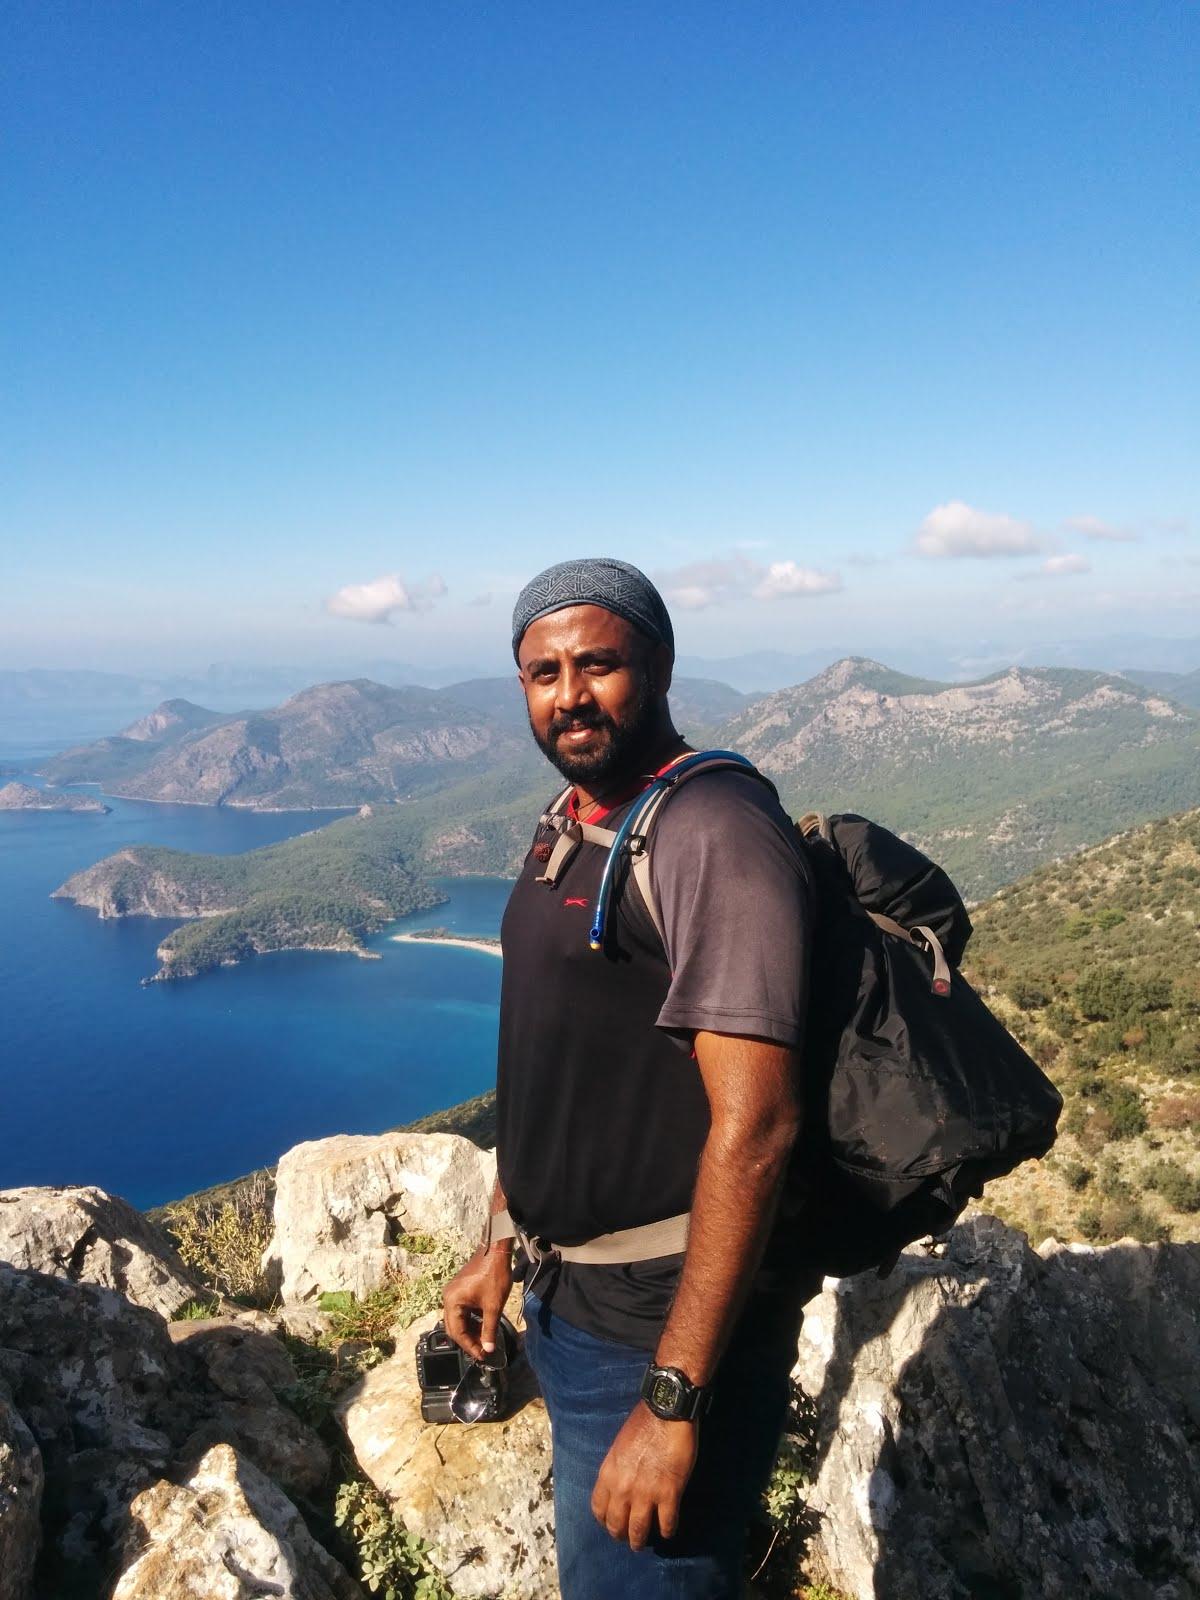 Summer Hiking at Lycian Way, Turkey